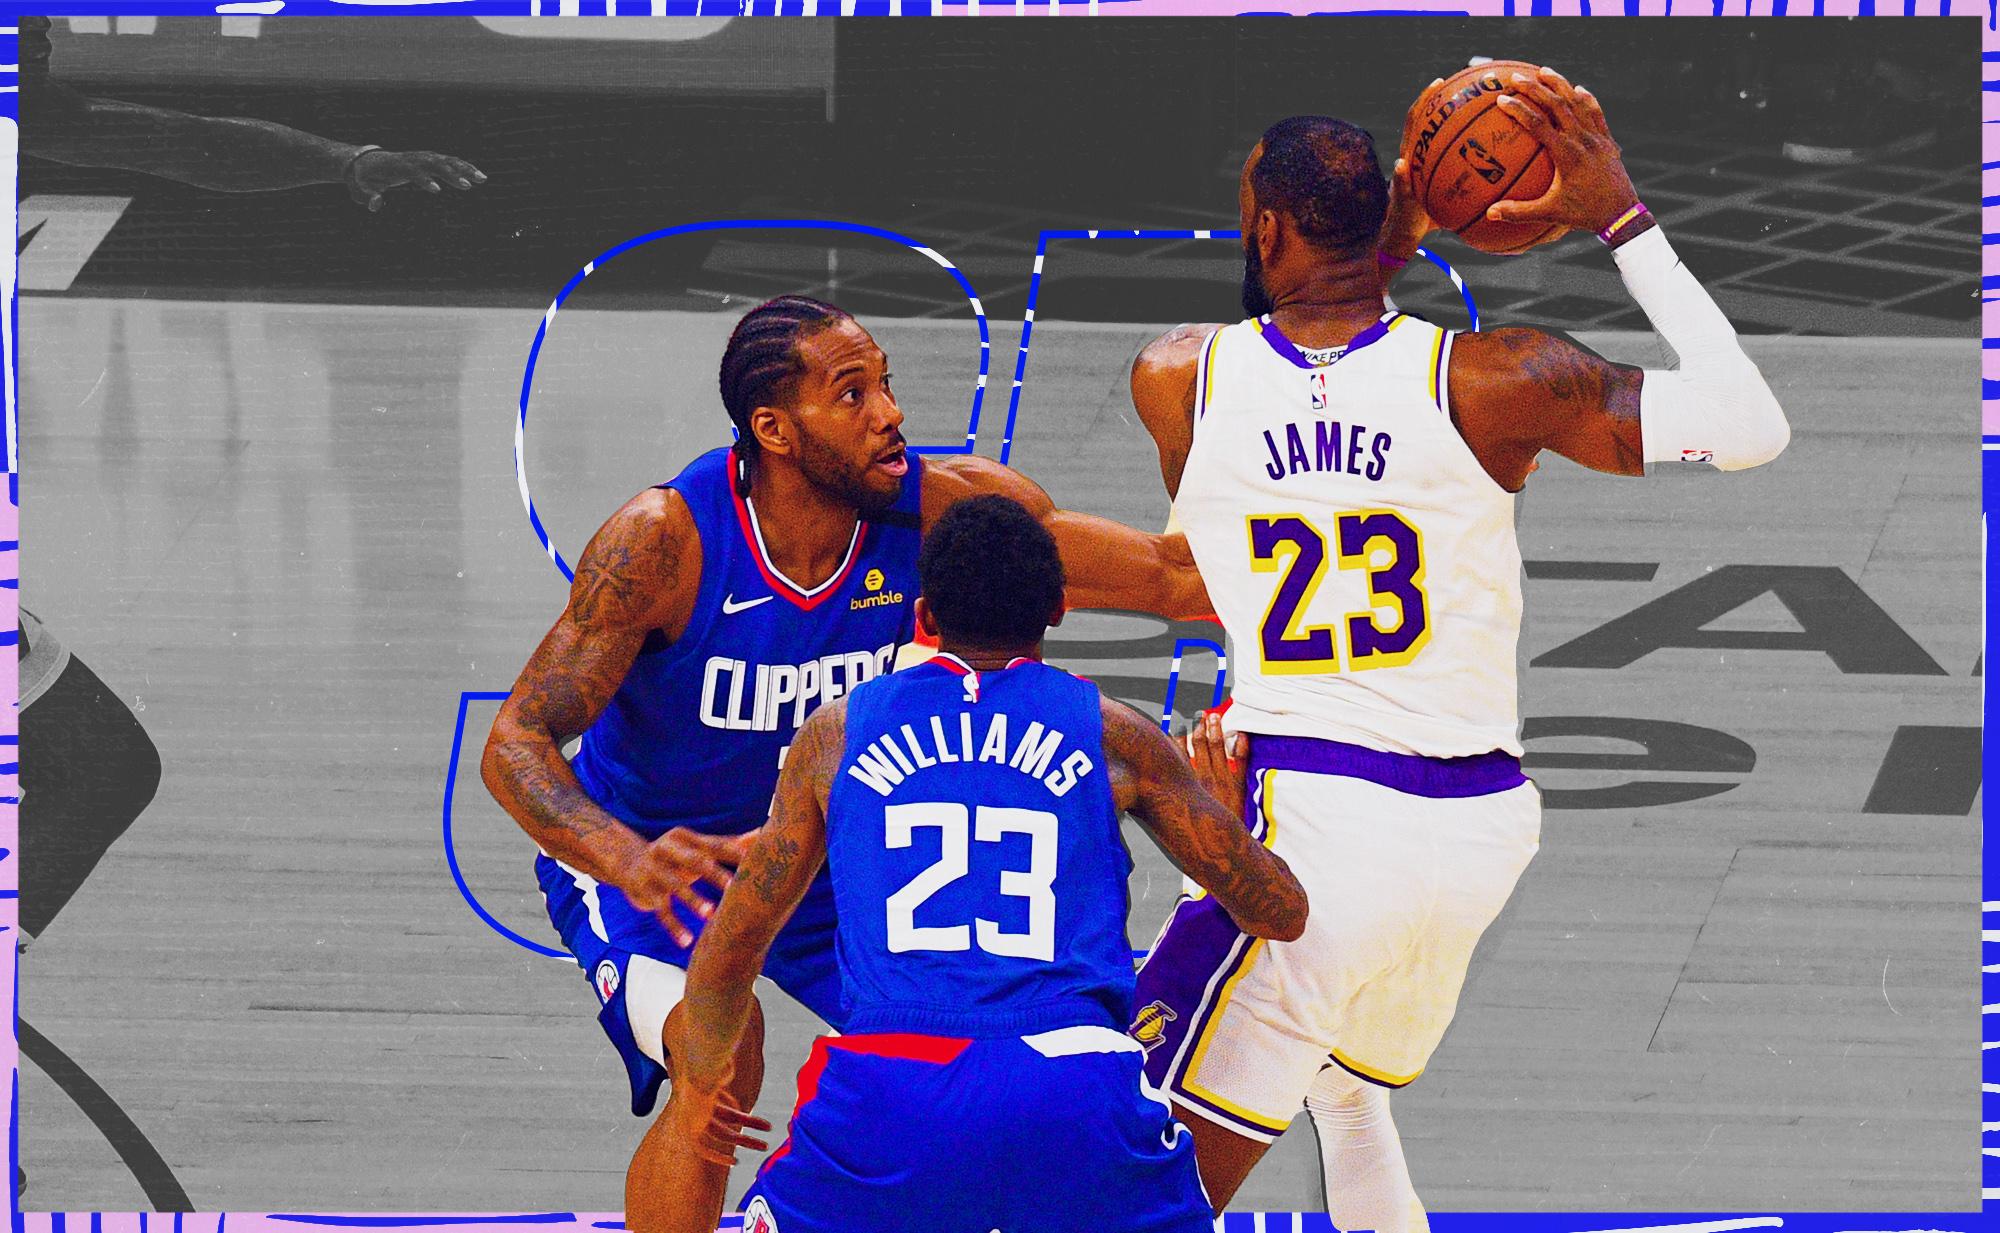 LeBron James defended by Kawhi Leonard and Paul George.